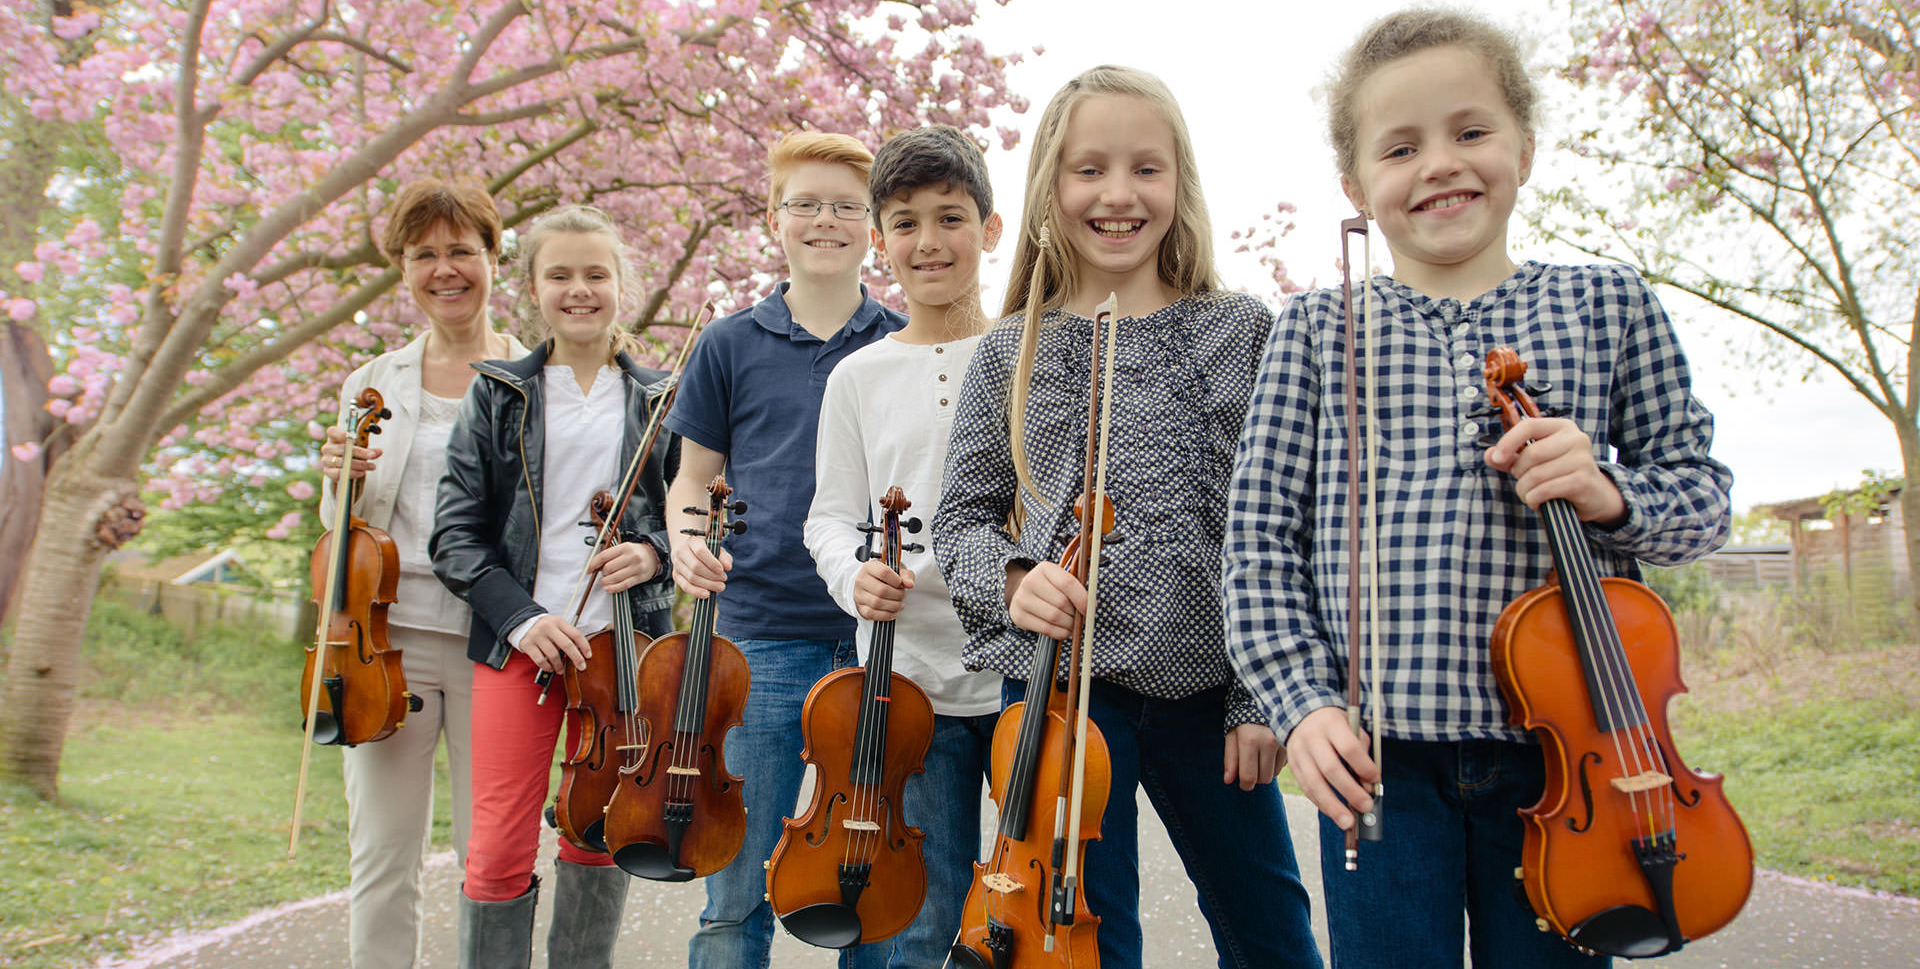 Geigenunterricht Bratschenunterricht Köln Sülz Klettenberg Rhodenkirchen Schülergruppe